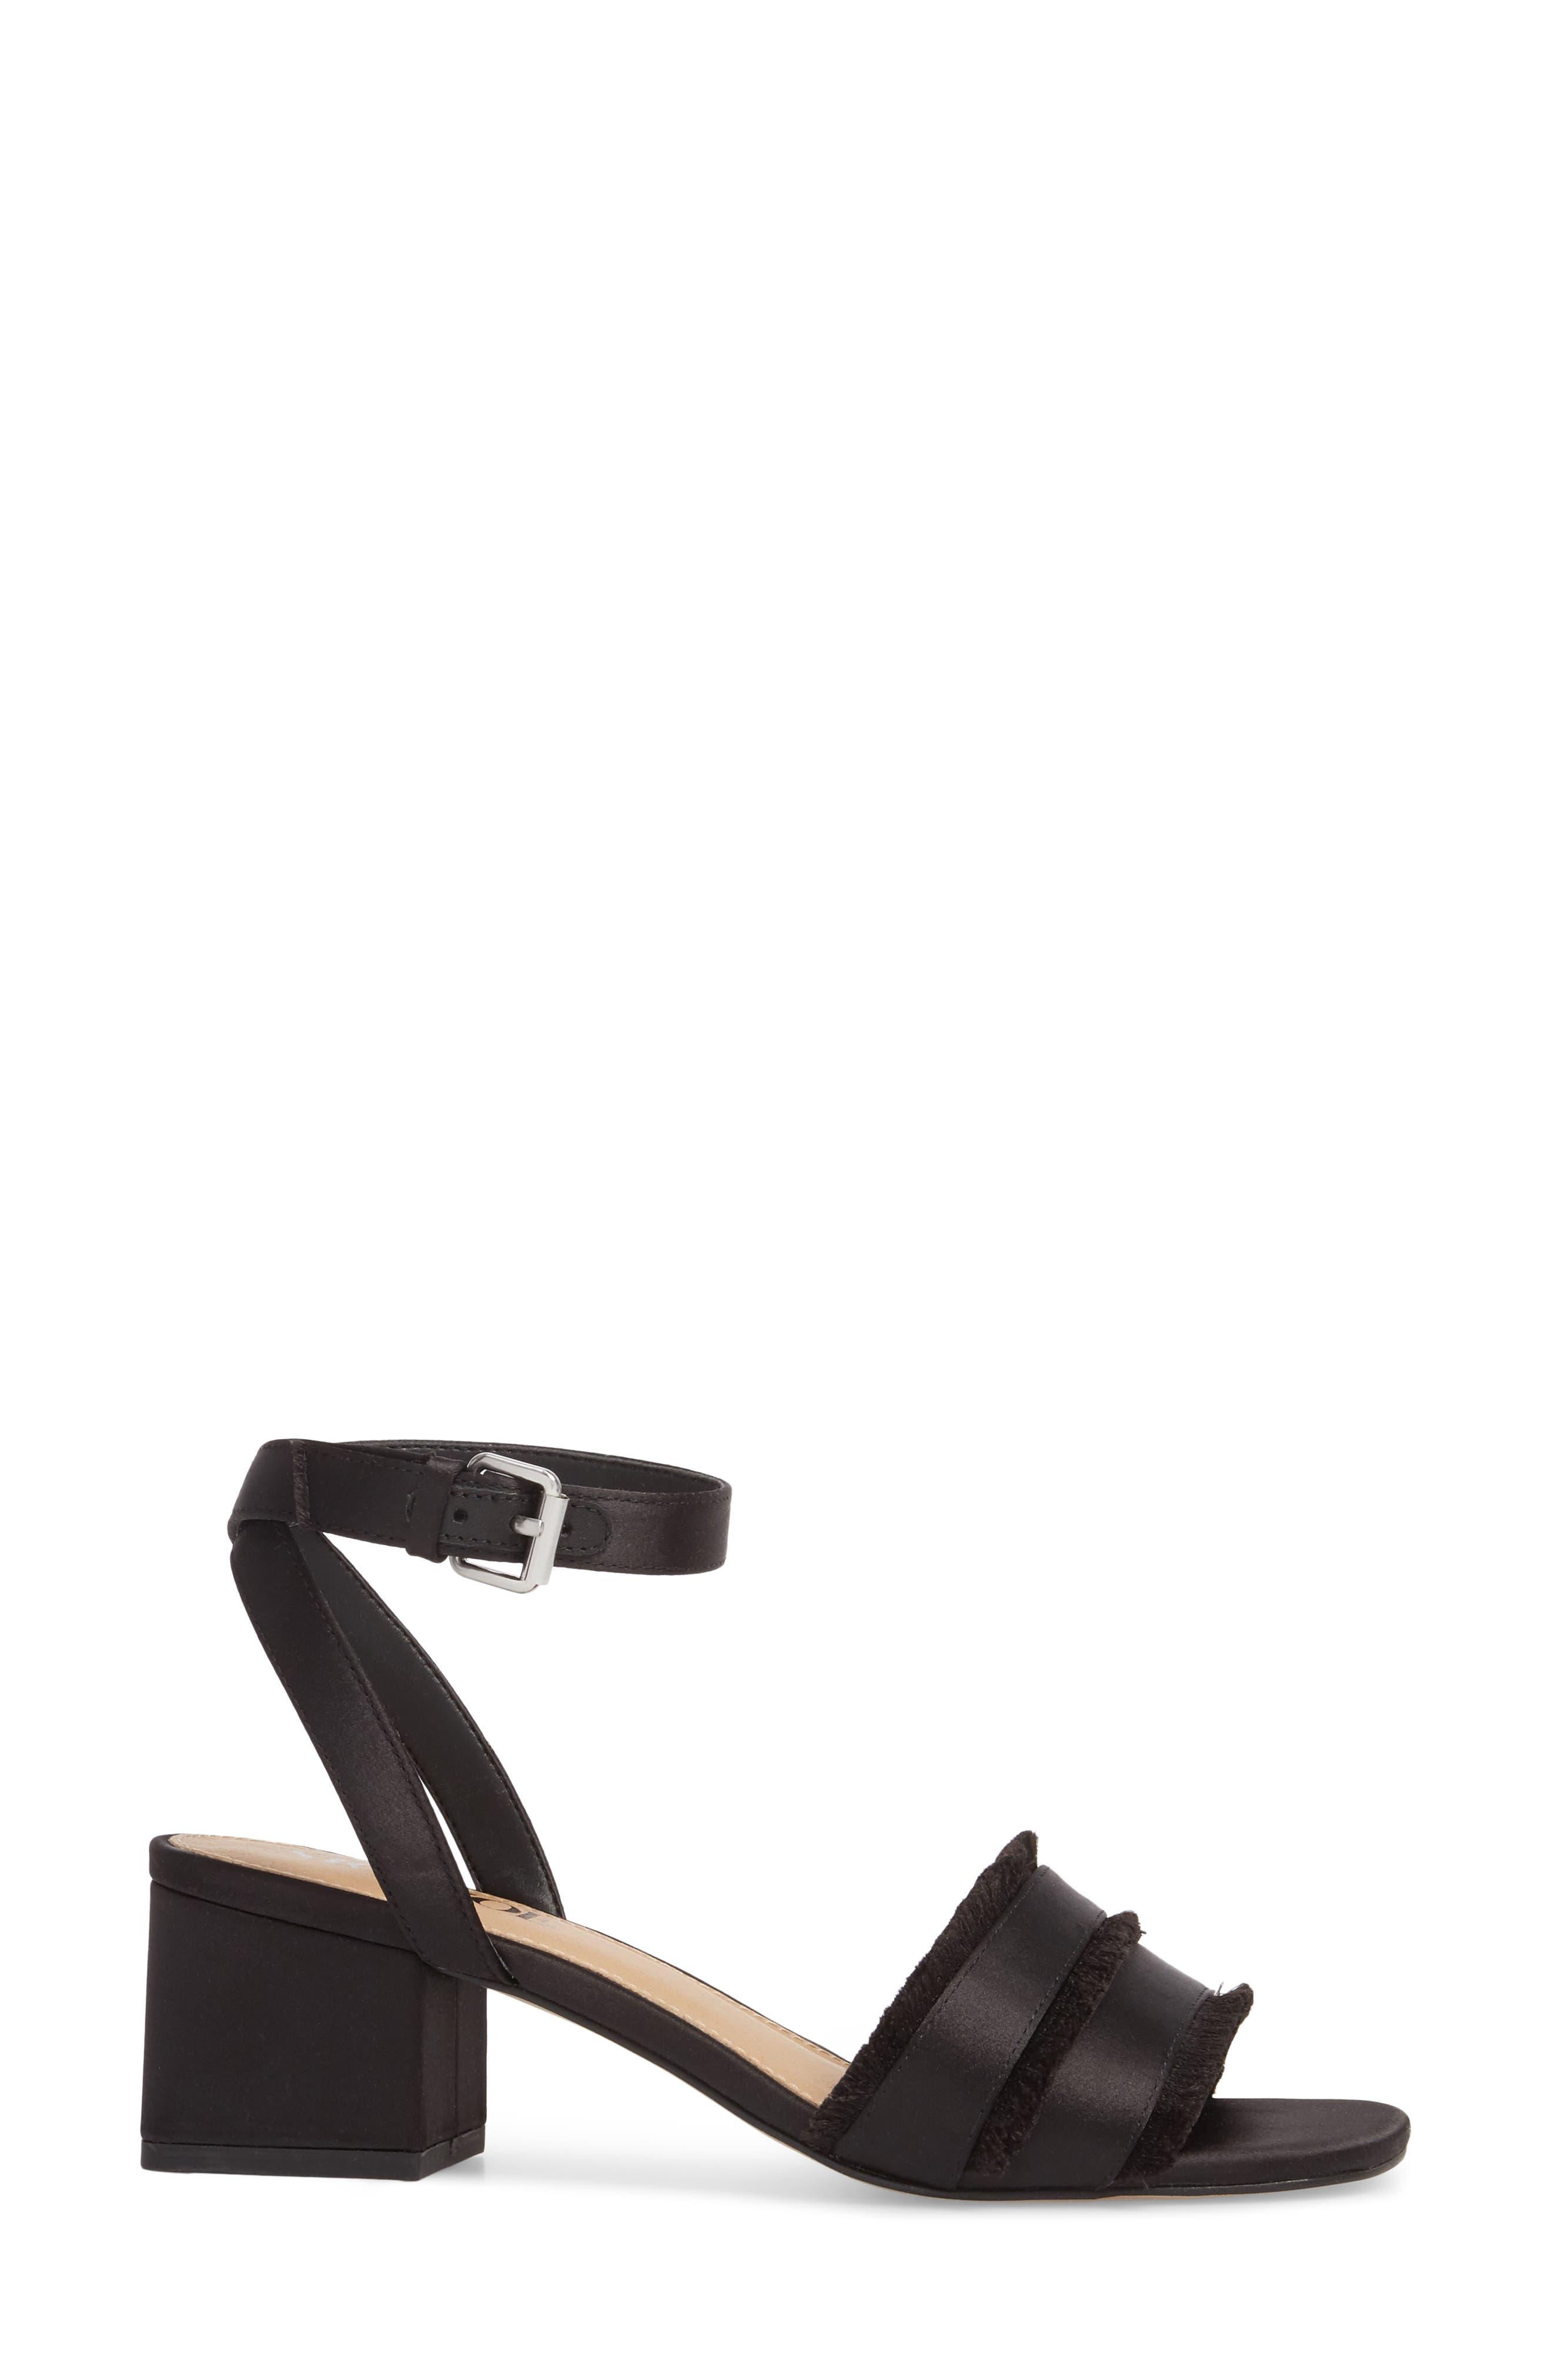 Zaria Fringed Sandal,                             Alternate thumbnail 3, color,                             BLACK SATIN